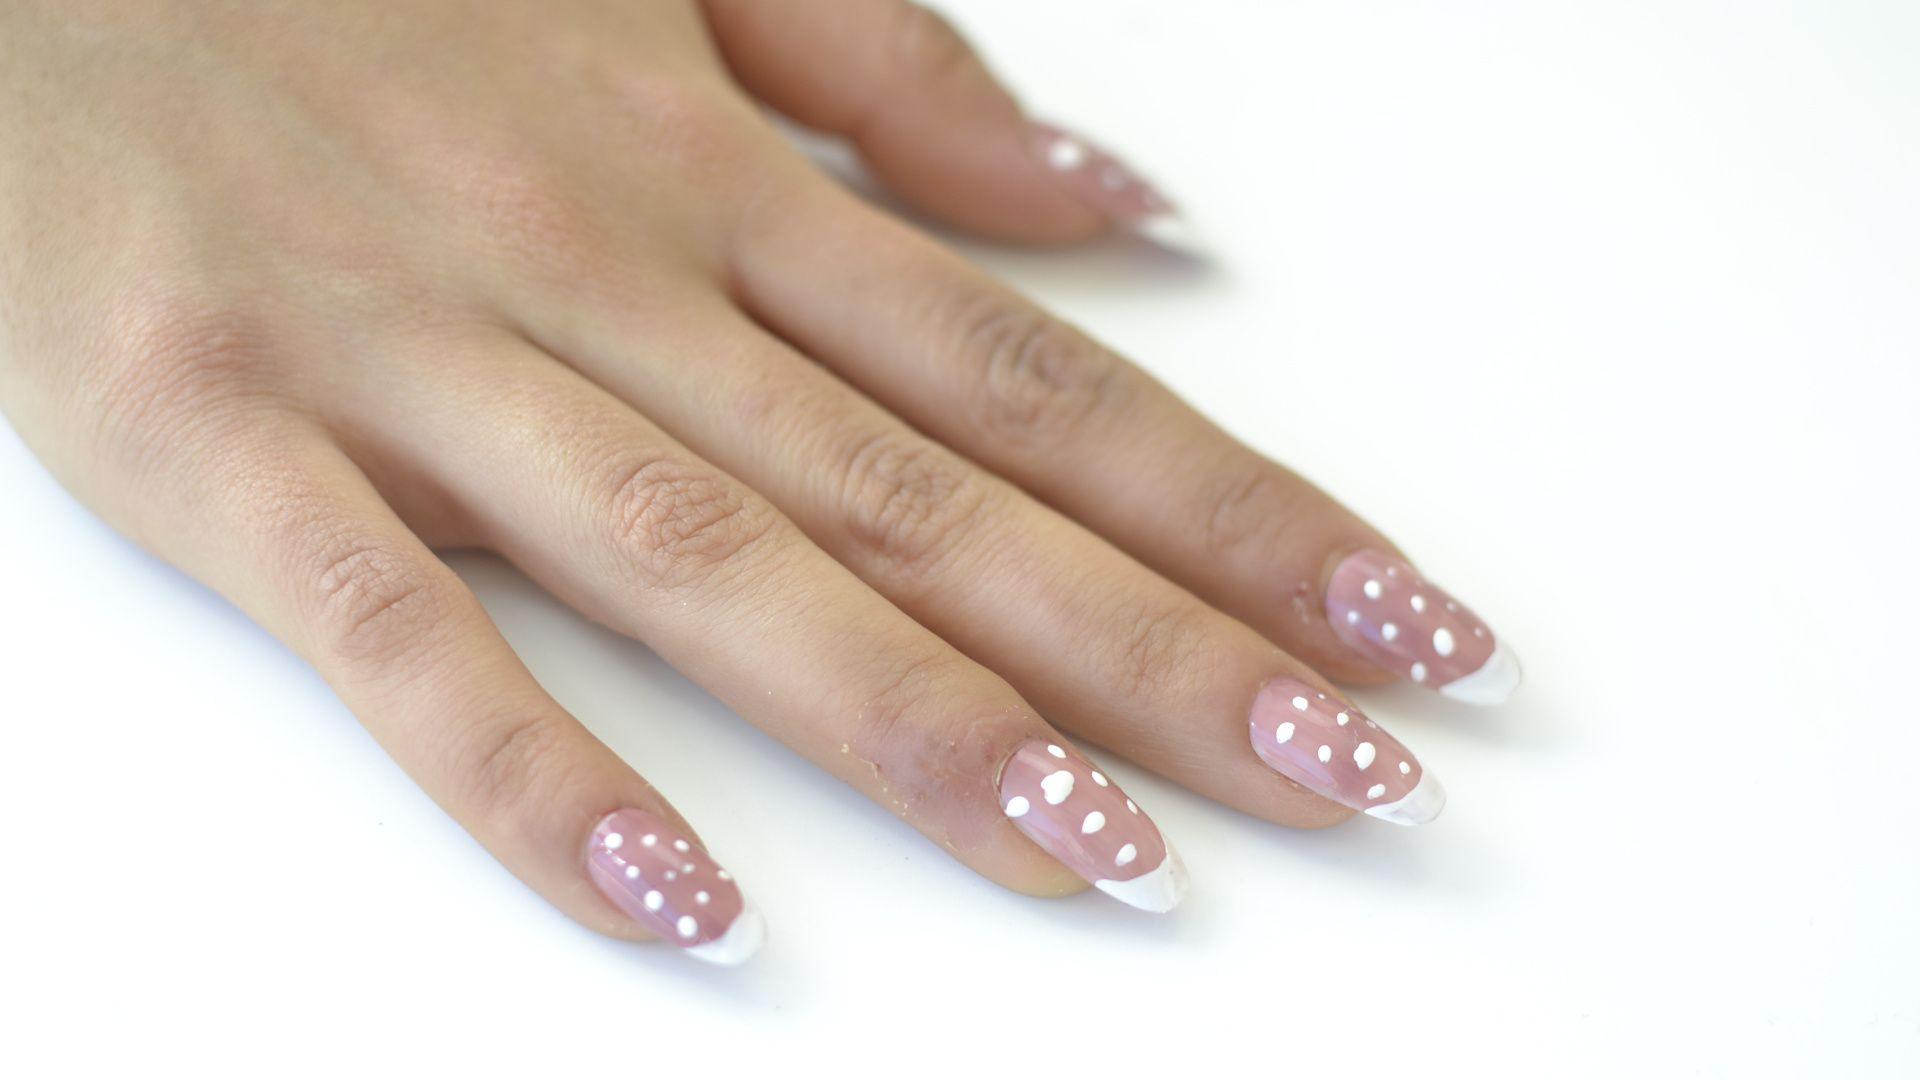 24 New Acrylic Nails Price - Apply Fake Nails Step 13 Version 3 | 24 ...